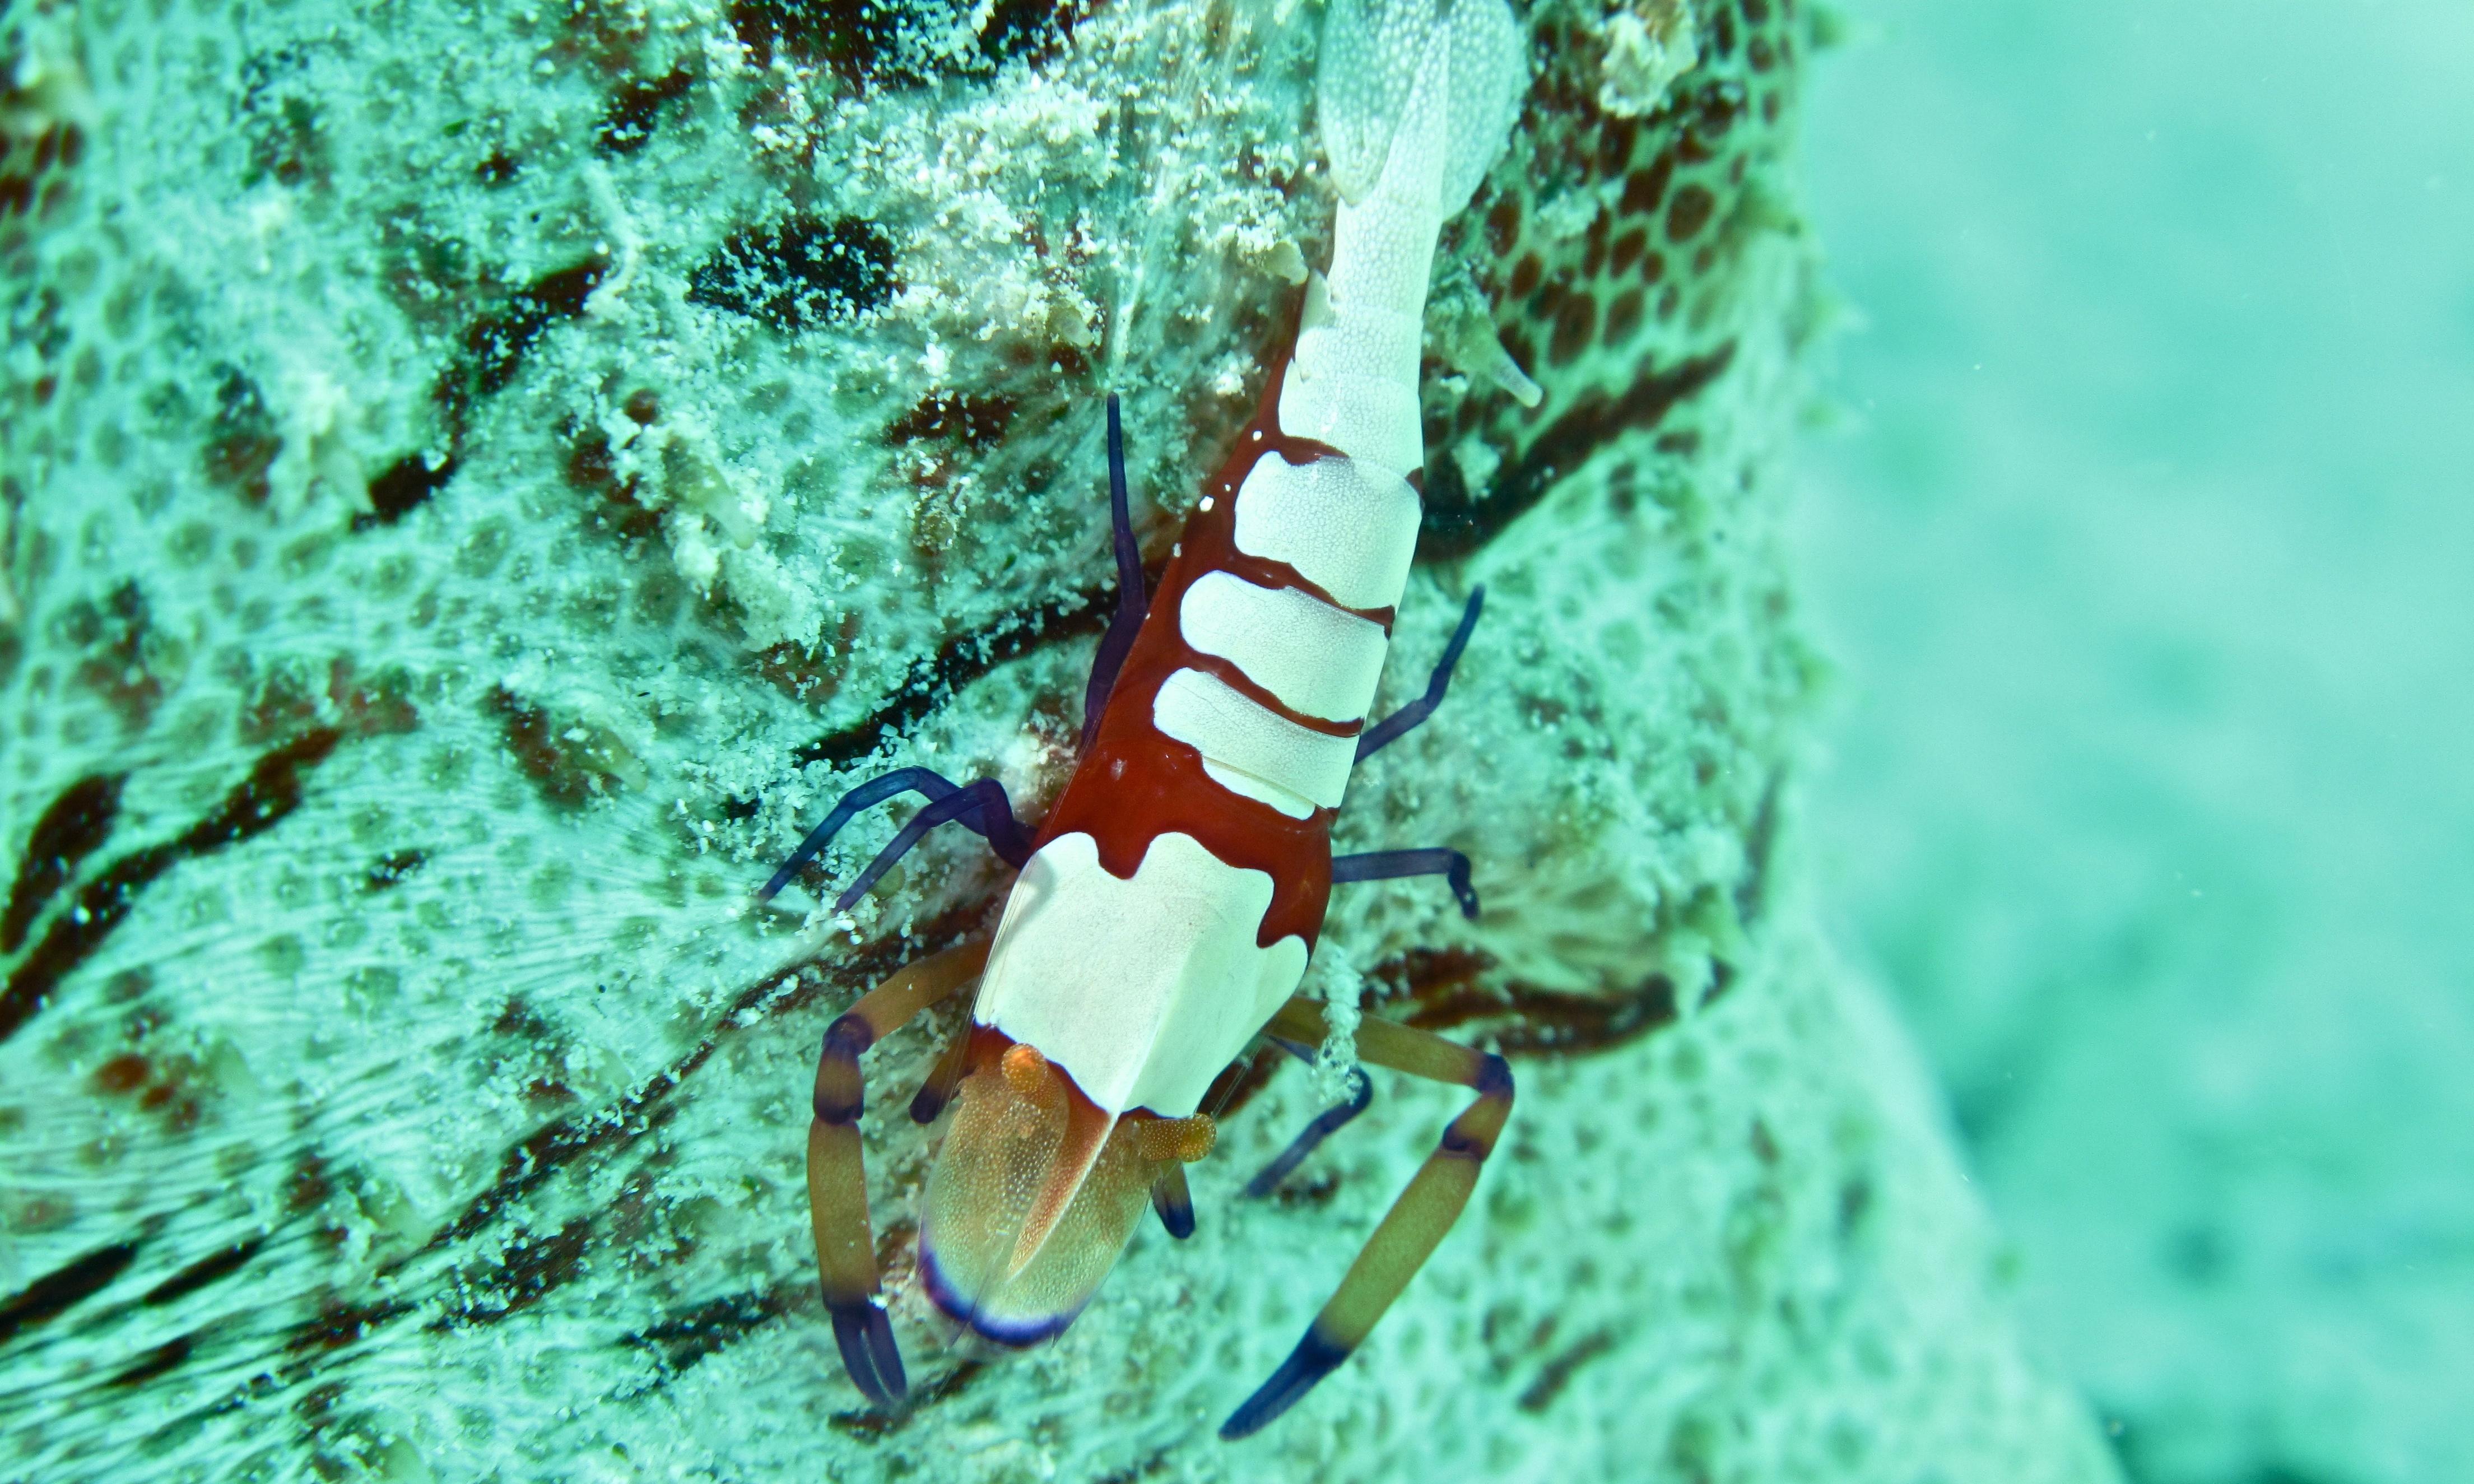 Image of Emperor shrimp